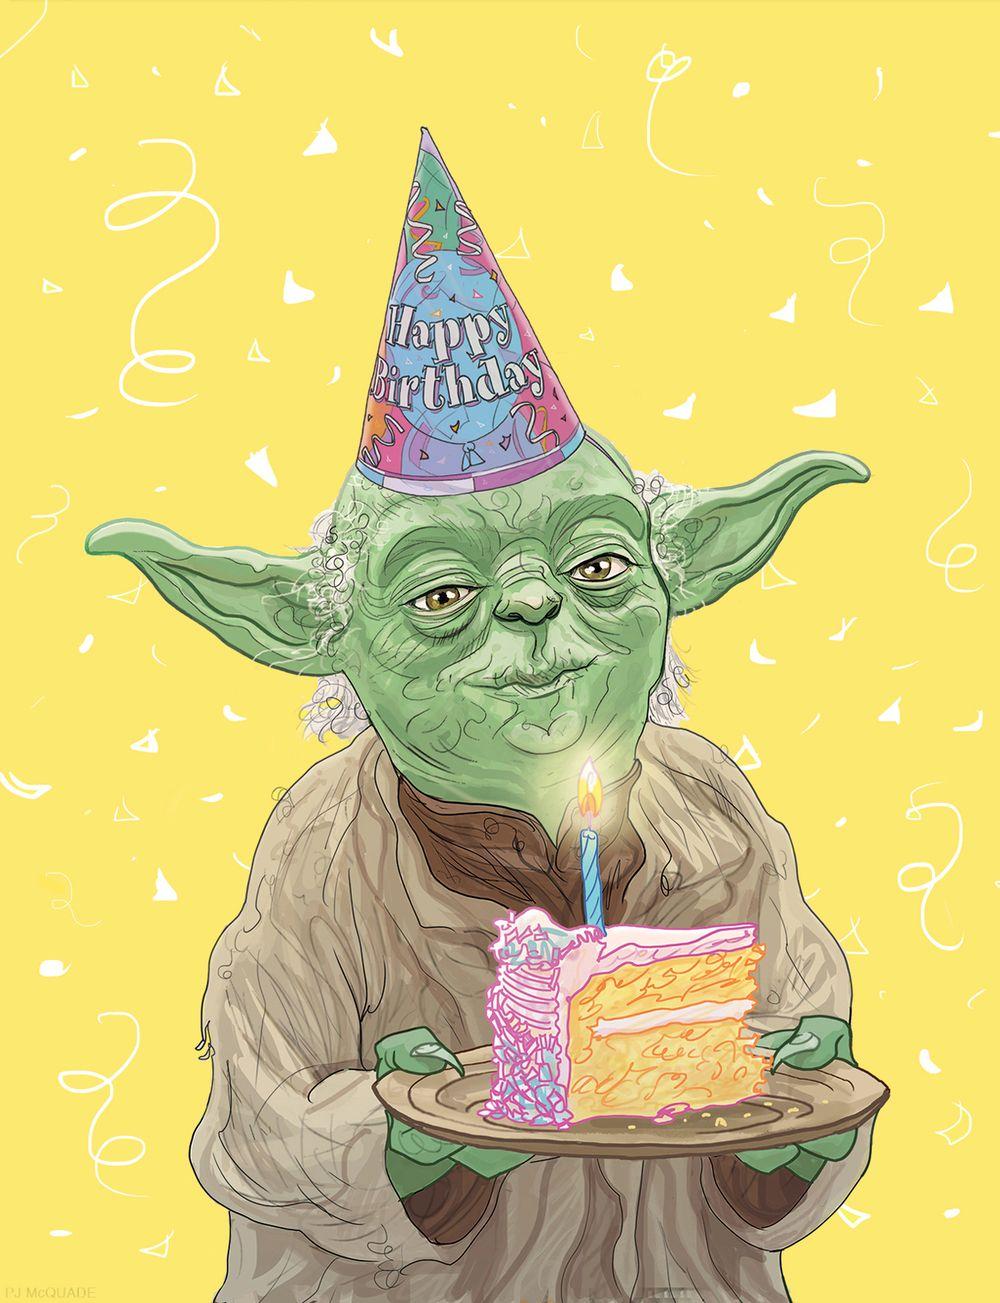 Star wars greeting cards google search cumpleañosfeliz